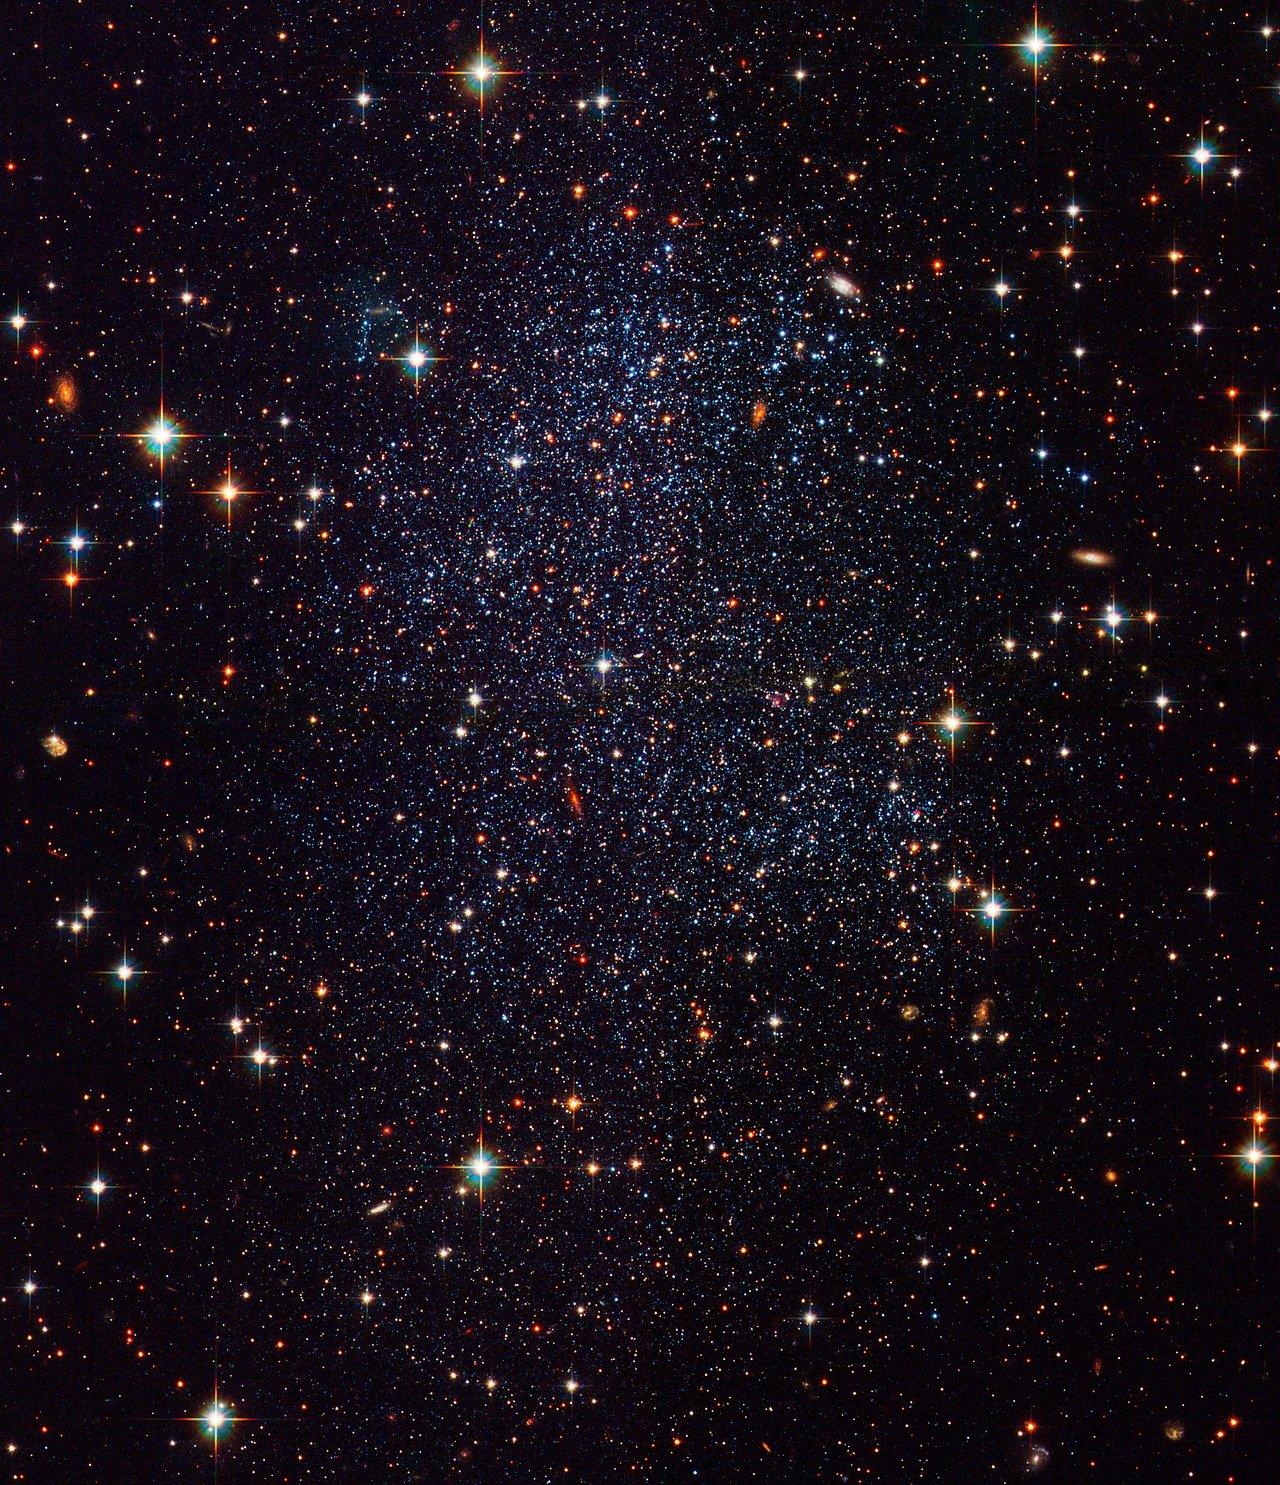 hubble irregular galaxy - photo #20